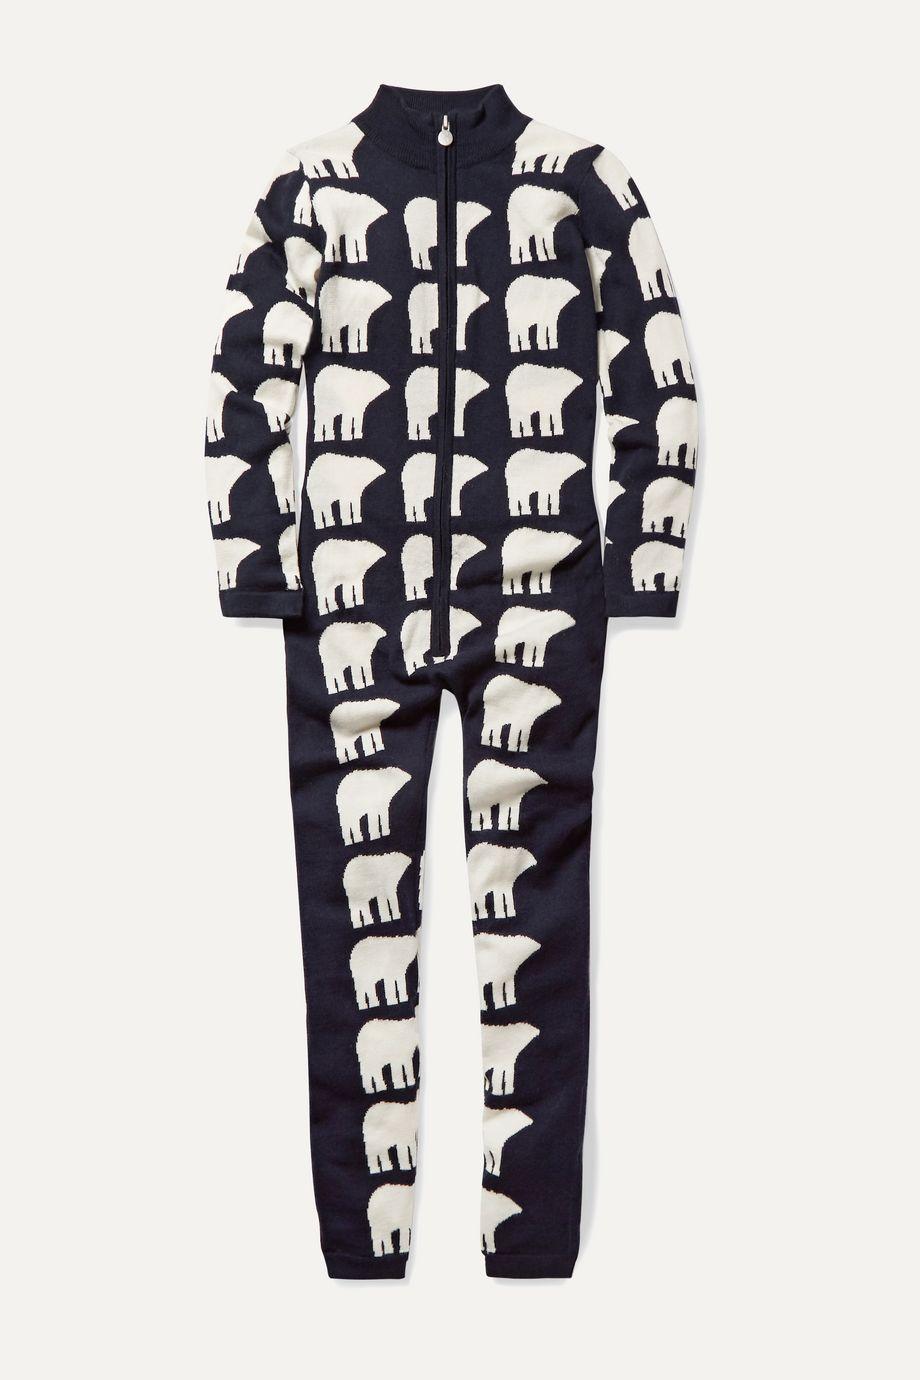 Perfect Moment Kids Ages 6 - 12 Star II intarsia merino wool jumpsuit